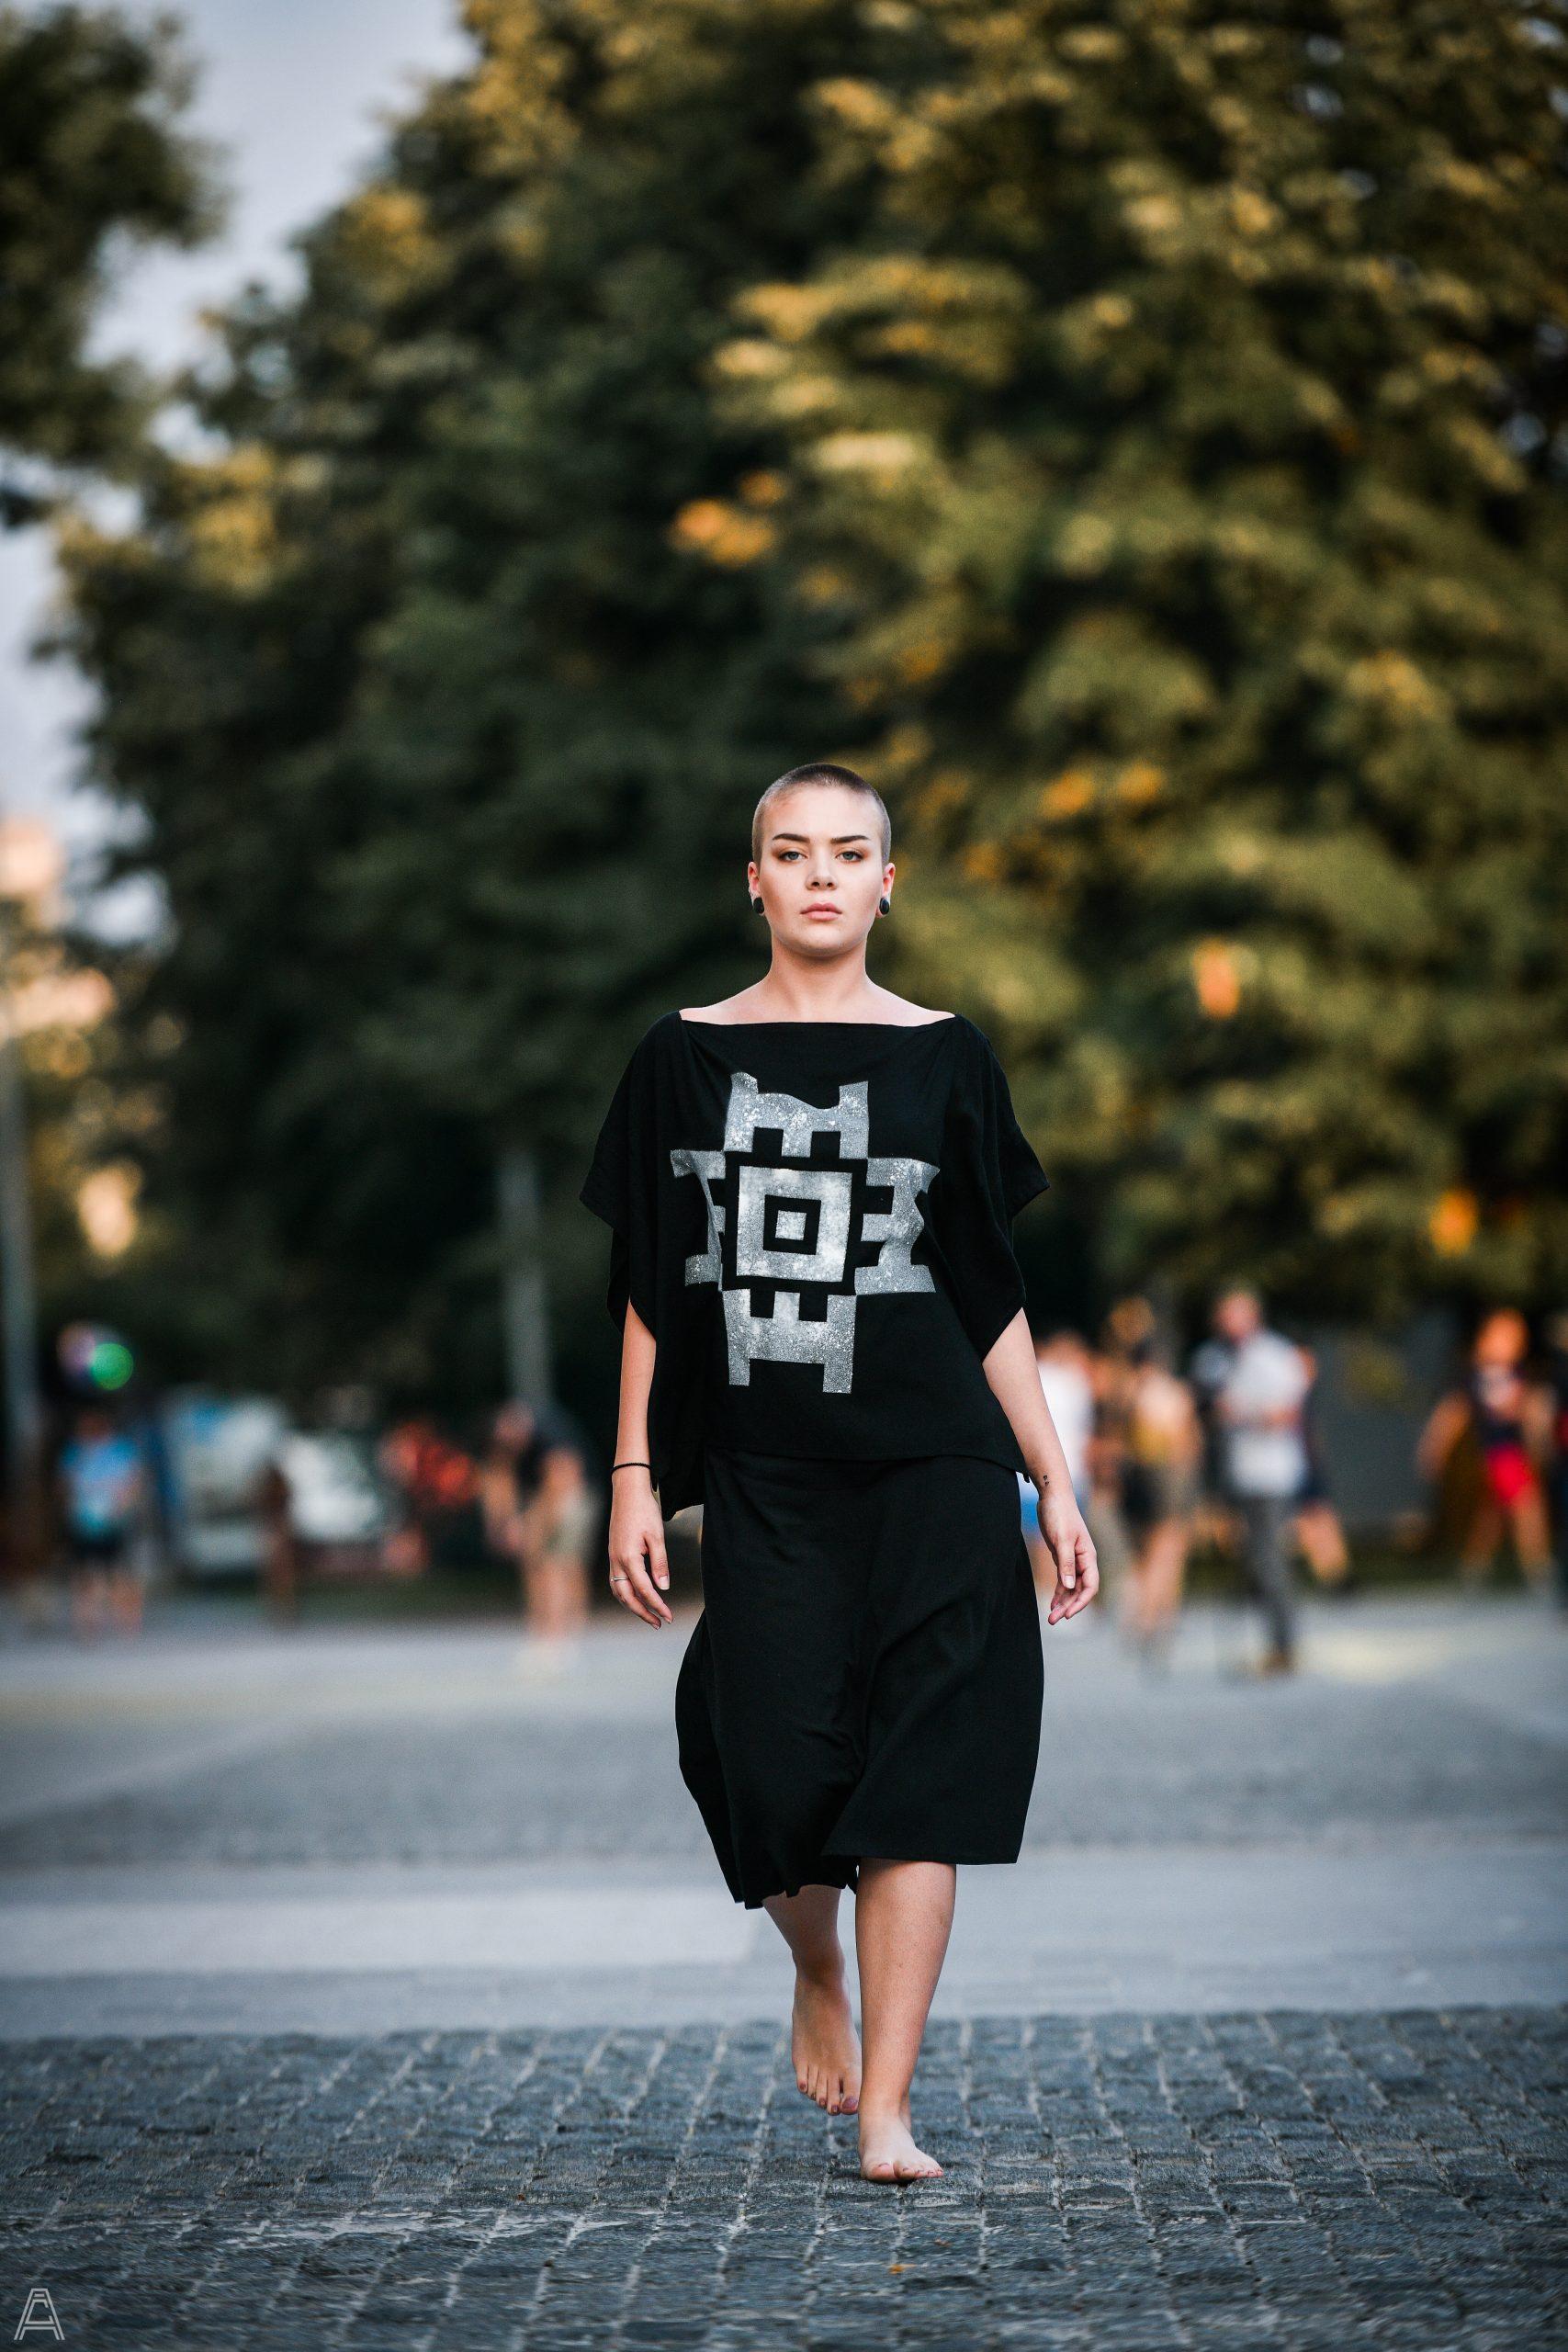 IMAGINARIUM Studio ZMIJANJE.design collection runaway / photo: Aleksandar Čavić / model: Lejla Handukić